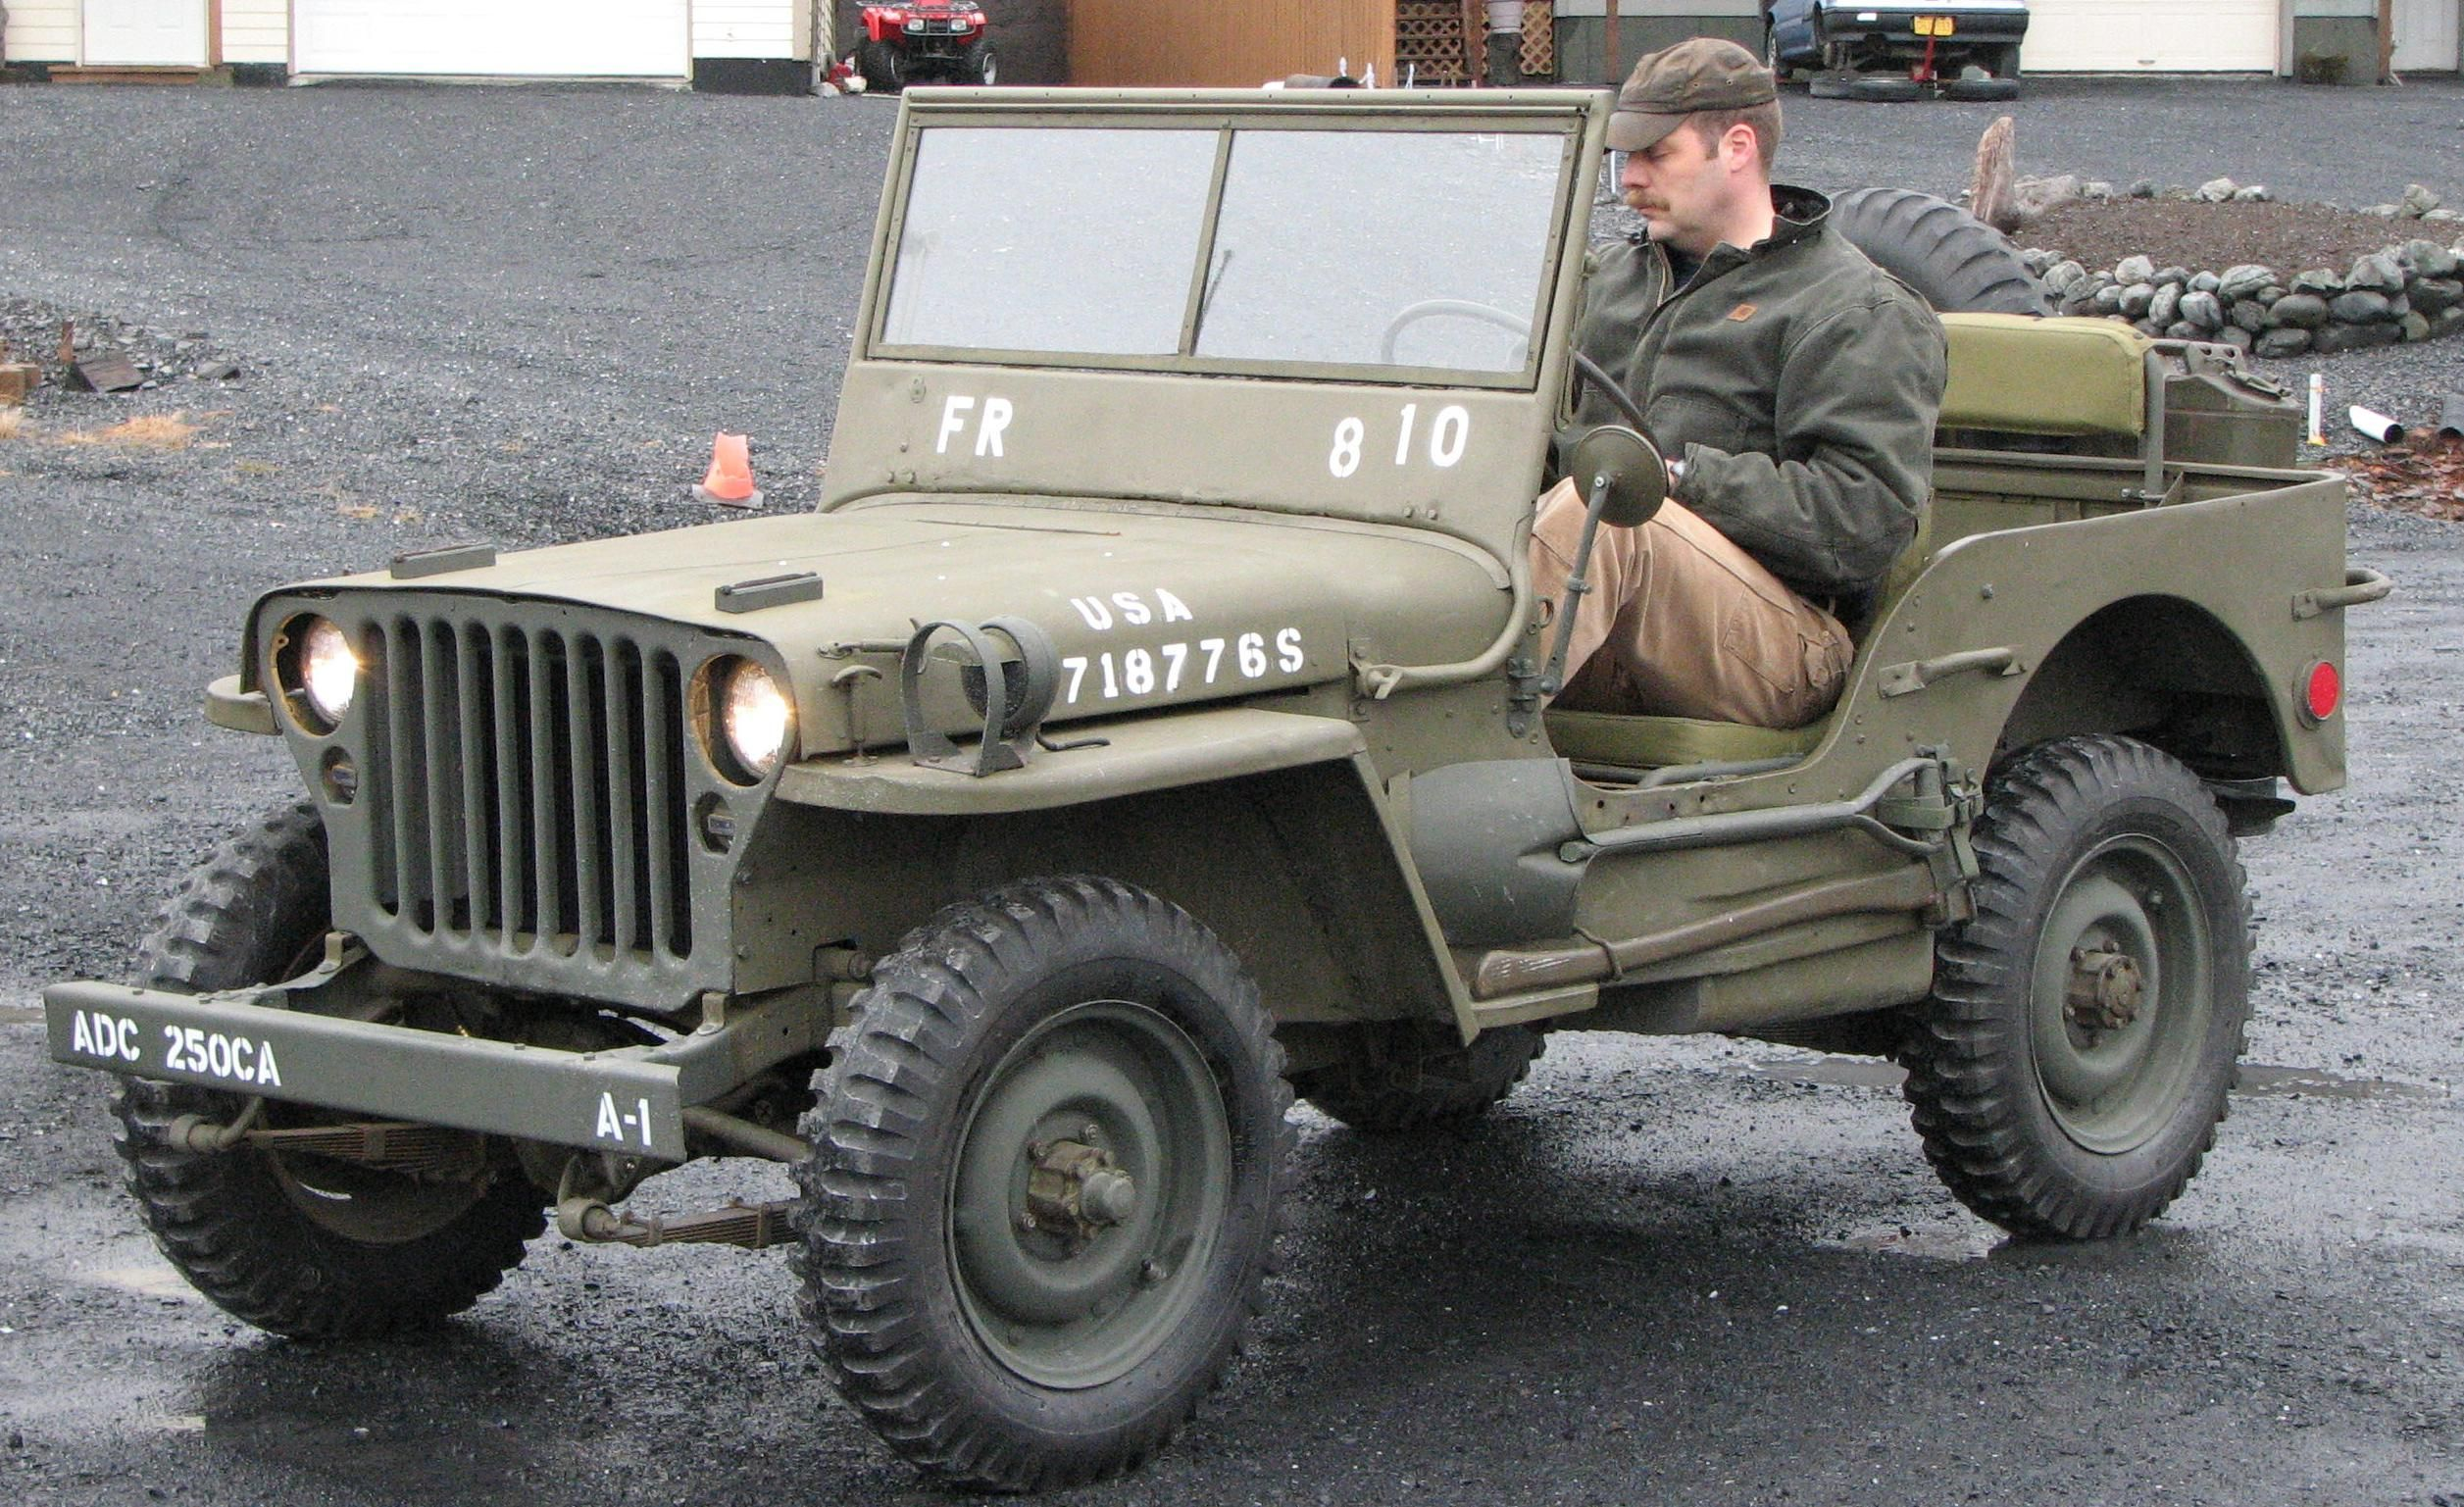 willys mb jeep [ 2513 x 1537 Pixel ]